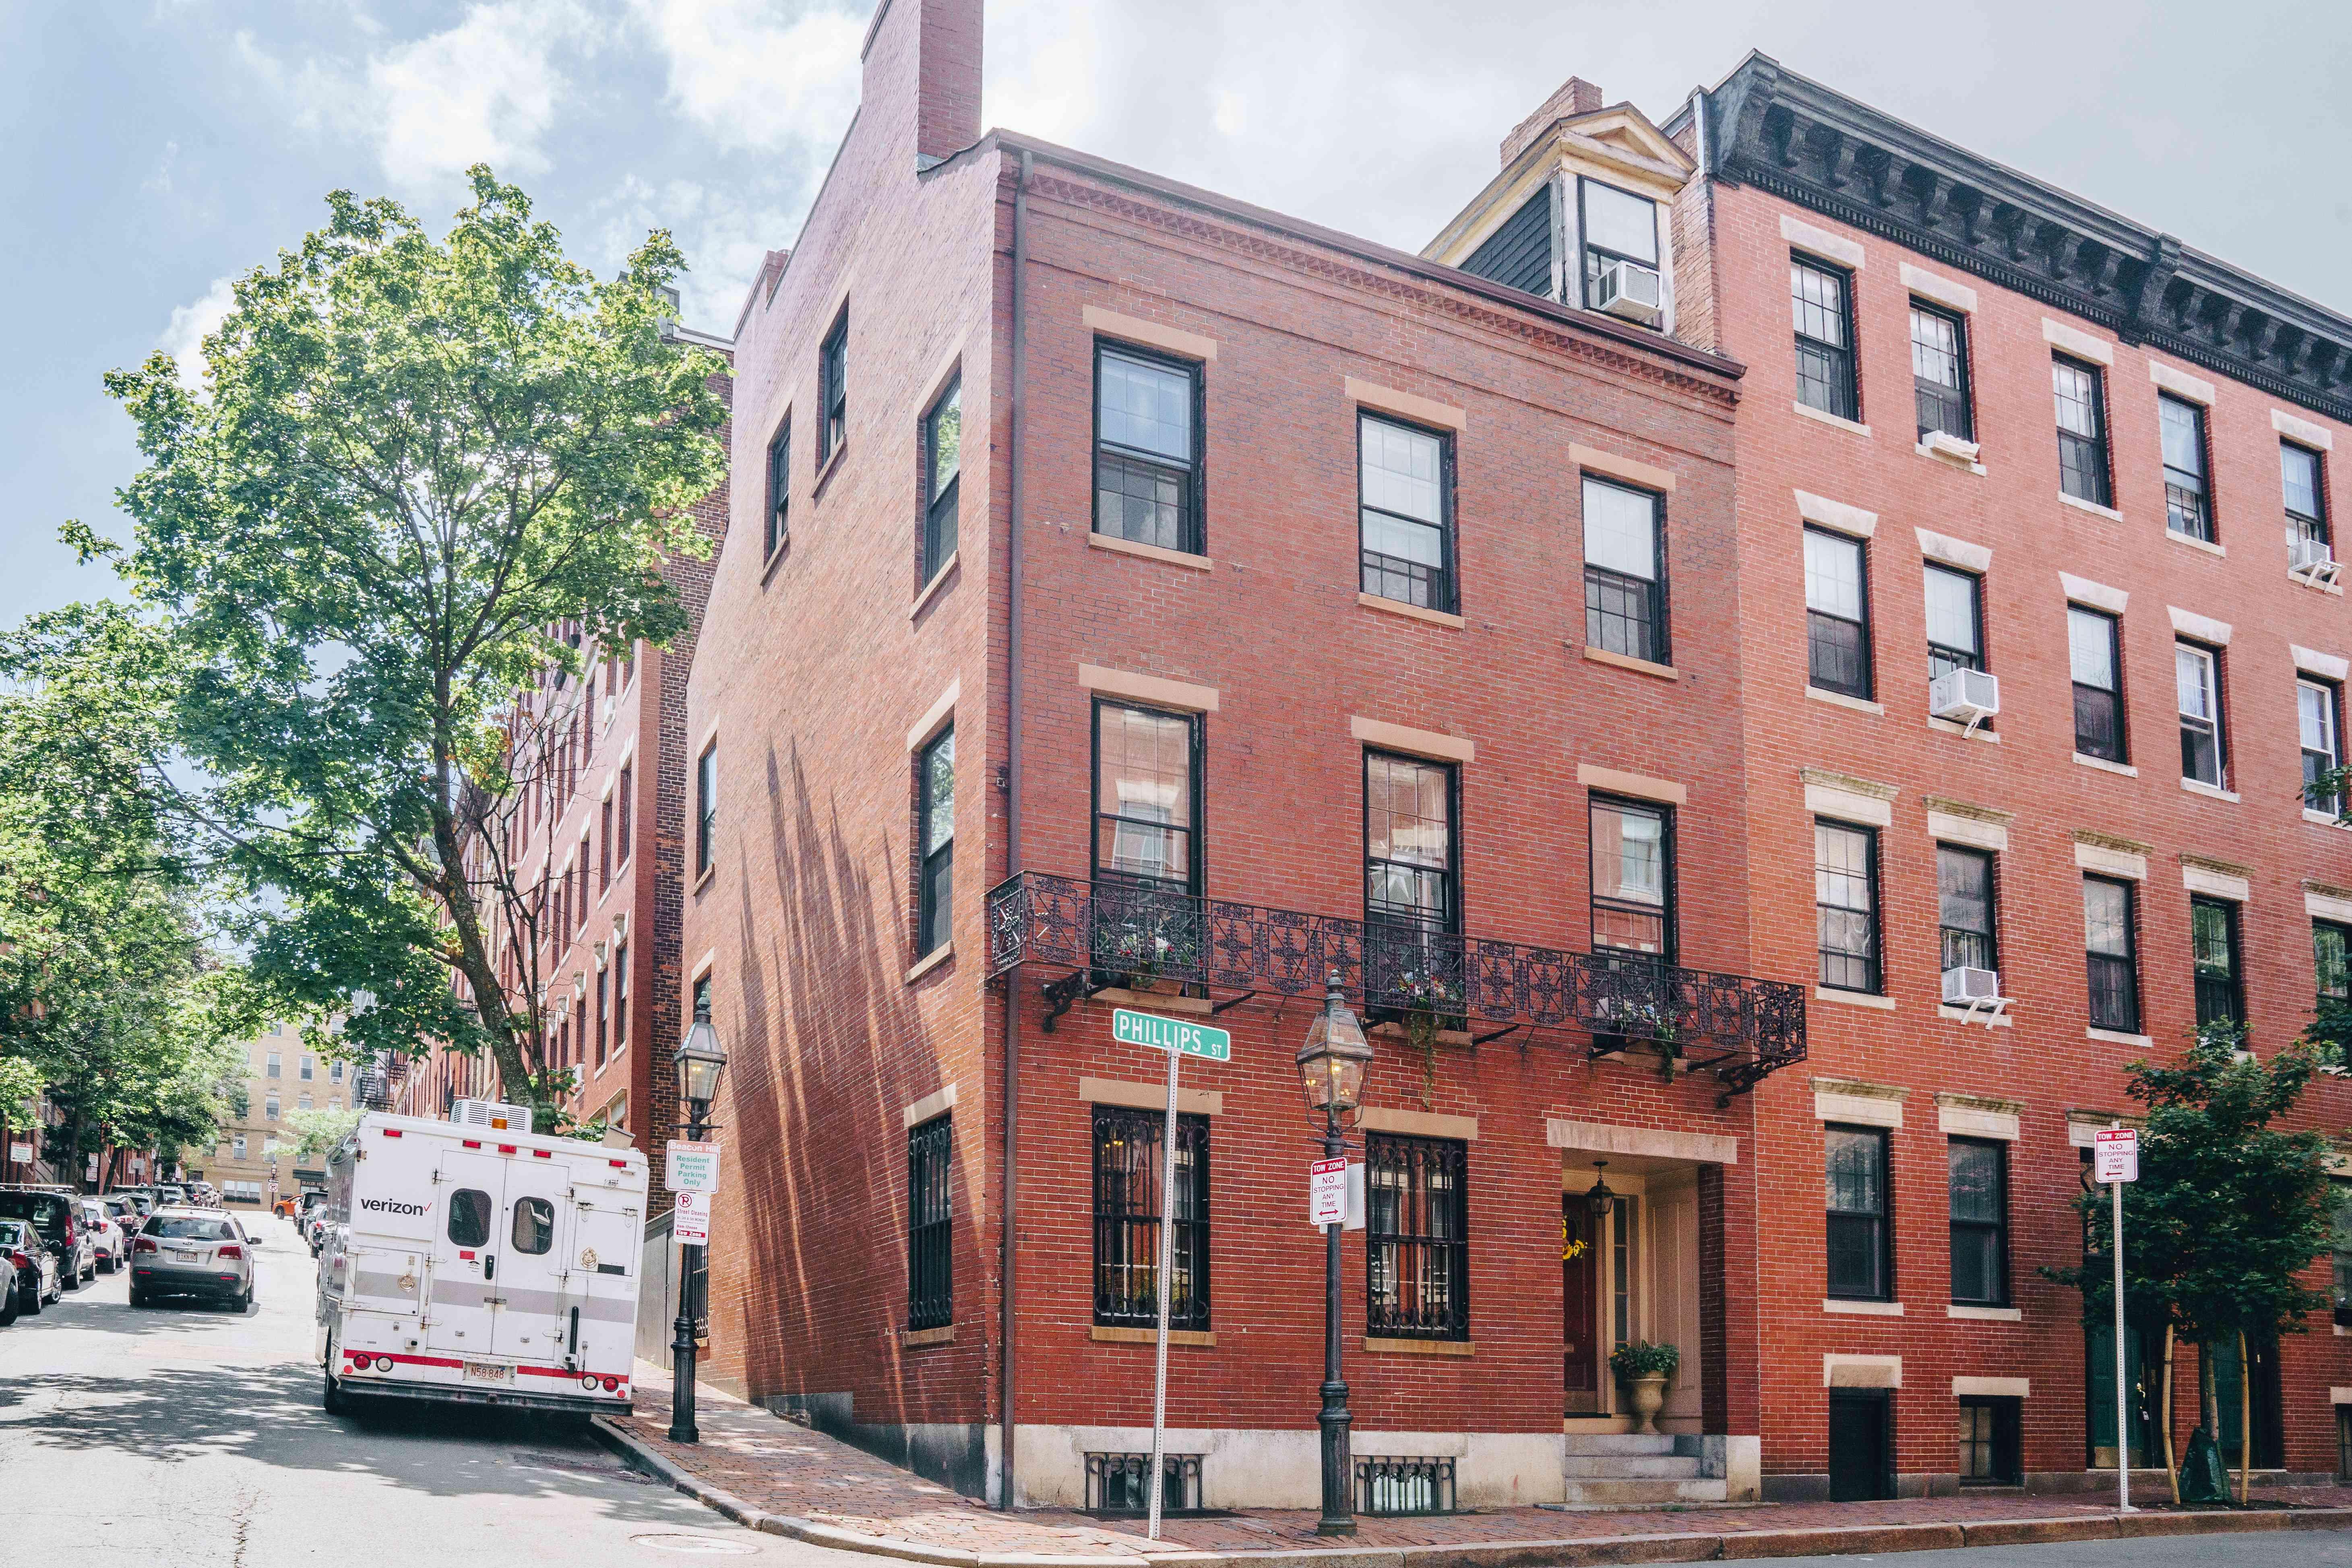 John Coburn house in Beacon Hill on the Black Heritage Trail in Boston